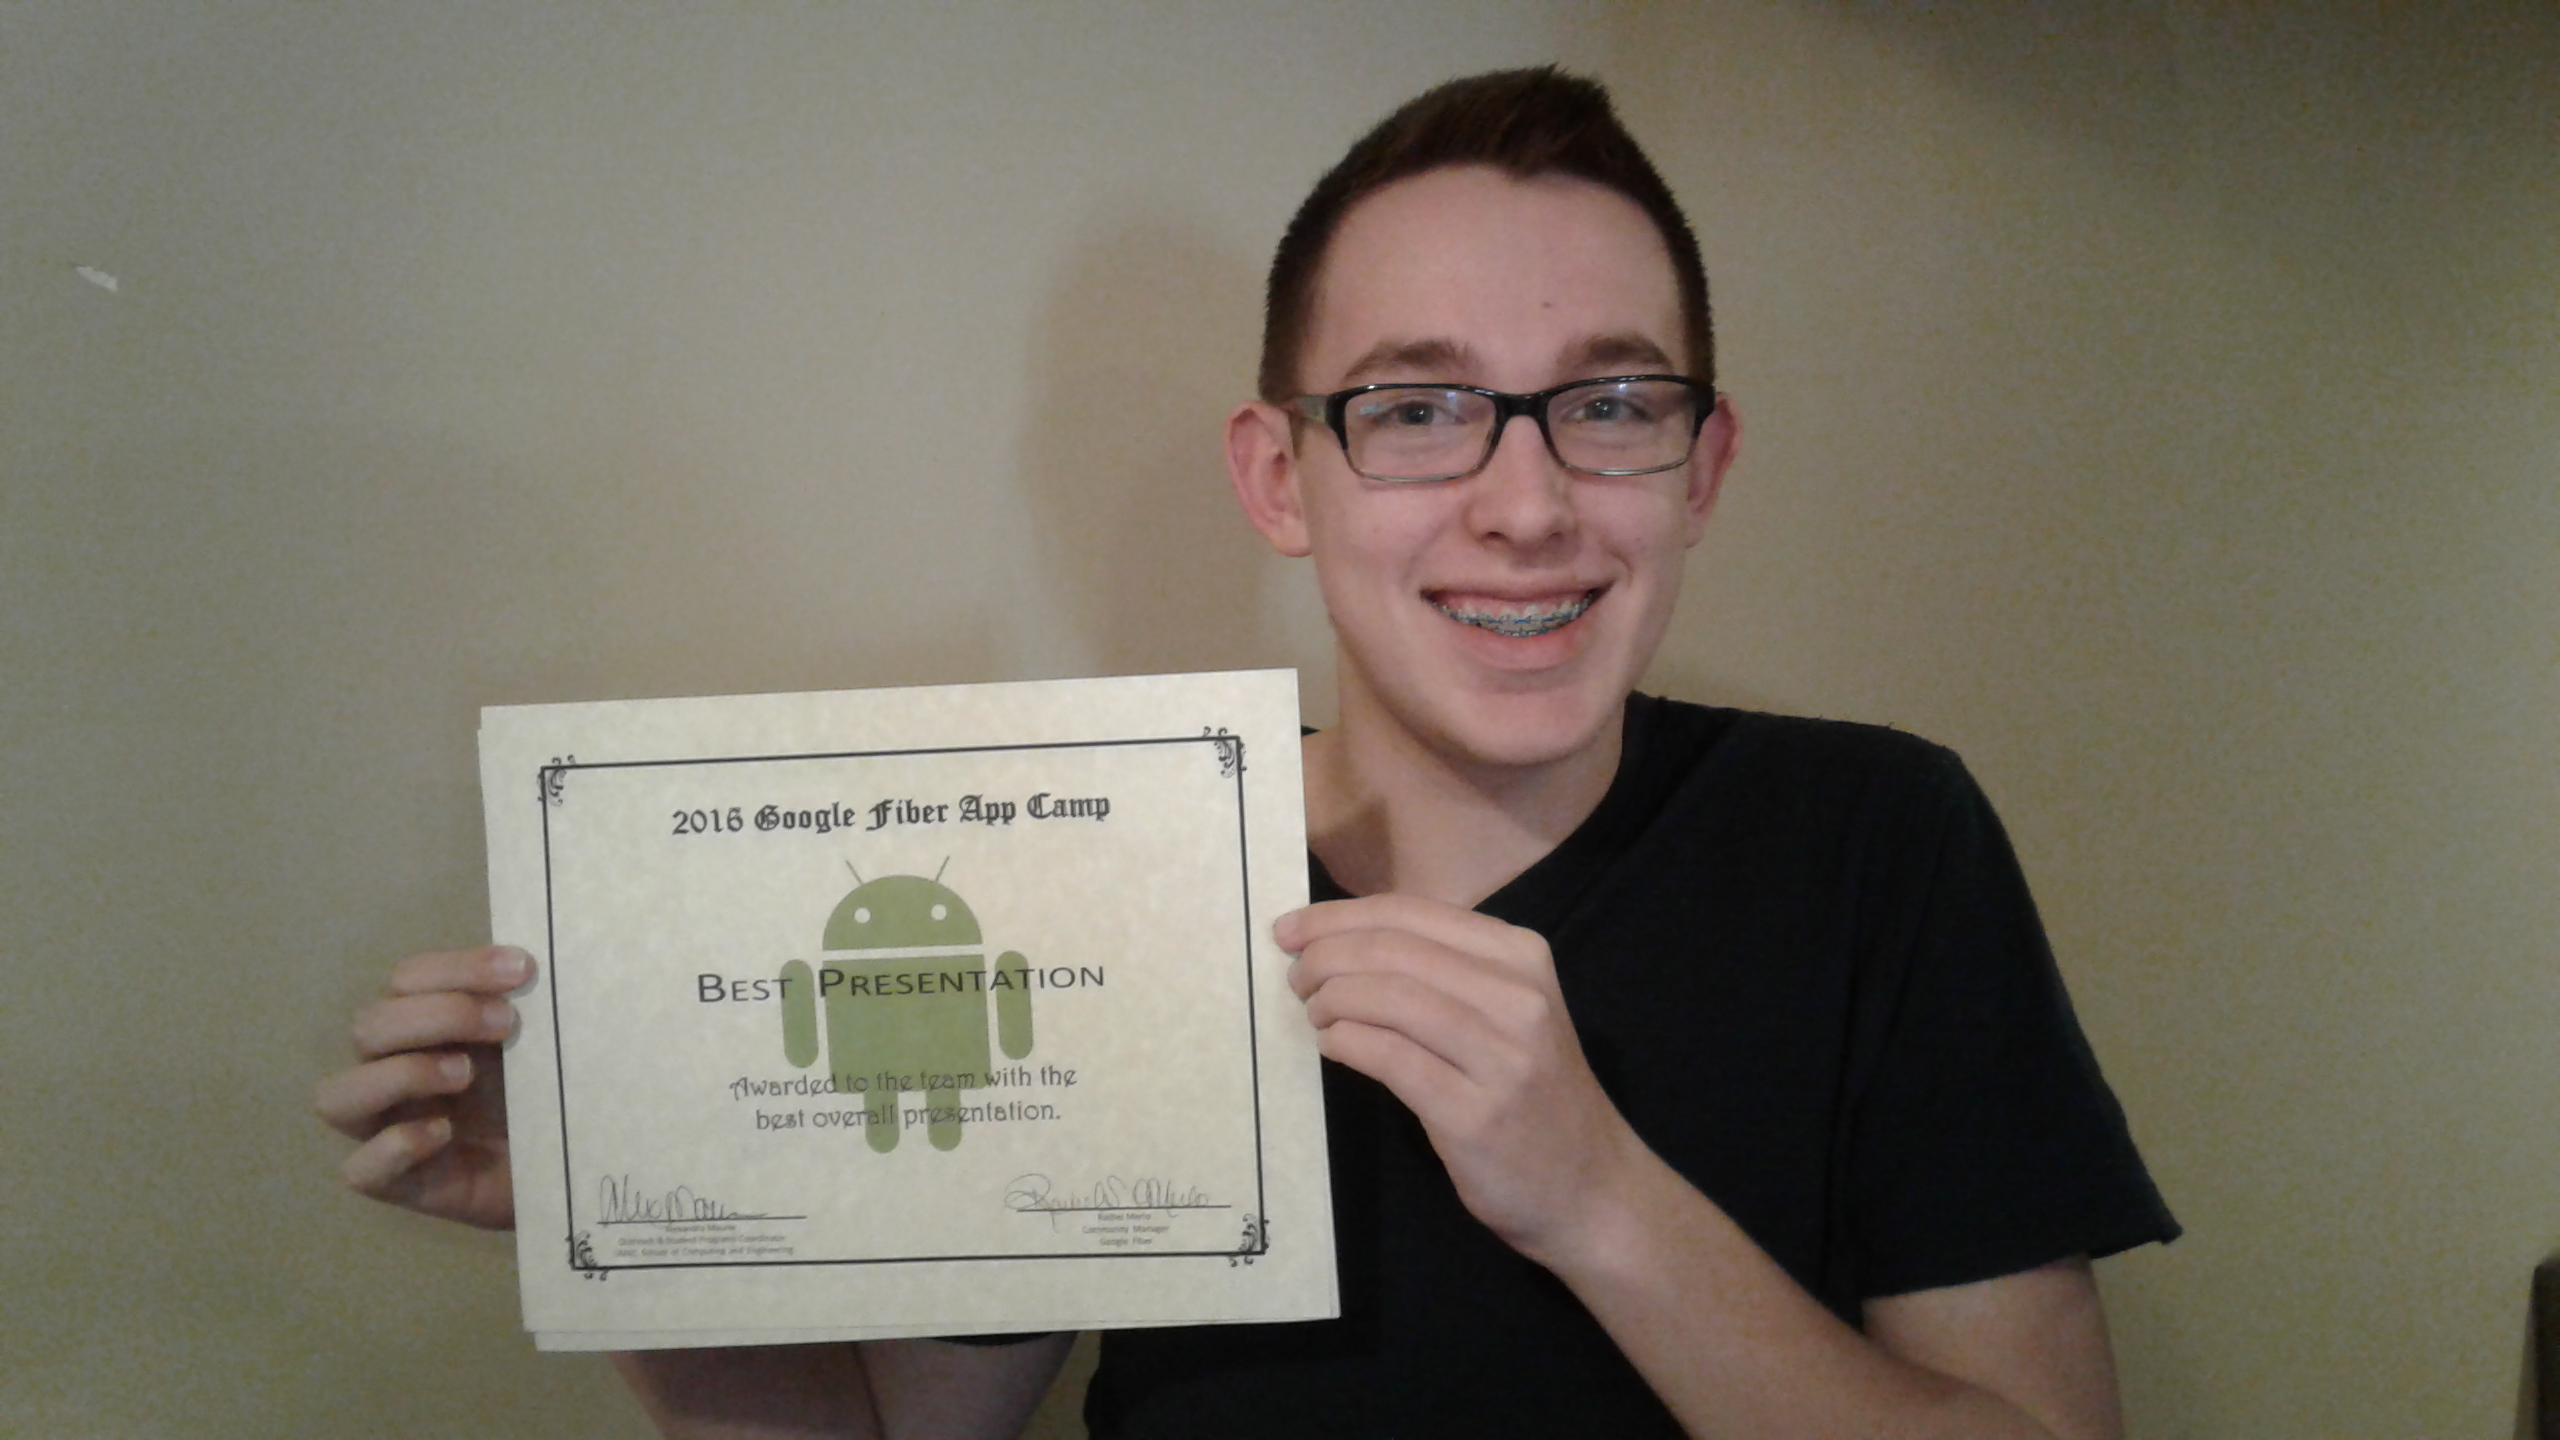 Grant's Team Wins Best Presentation Award